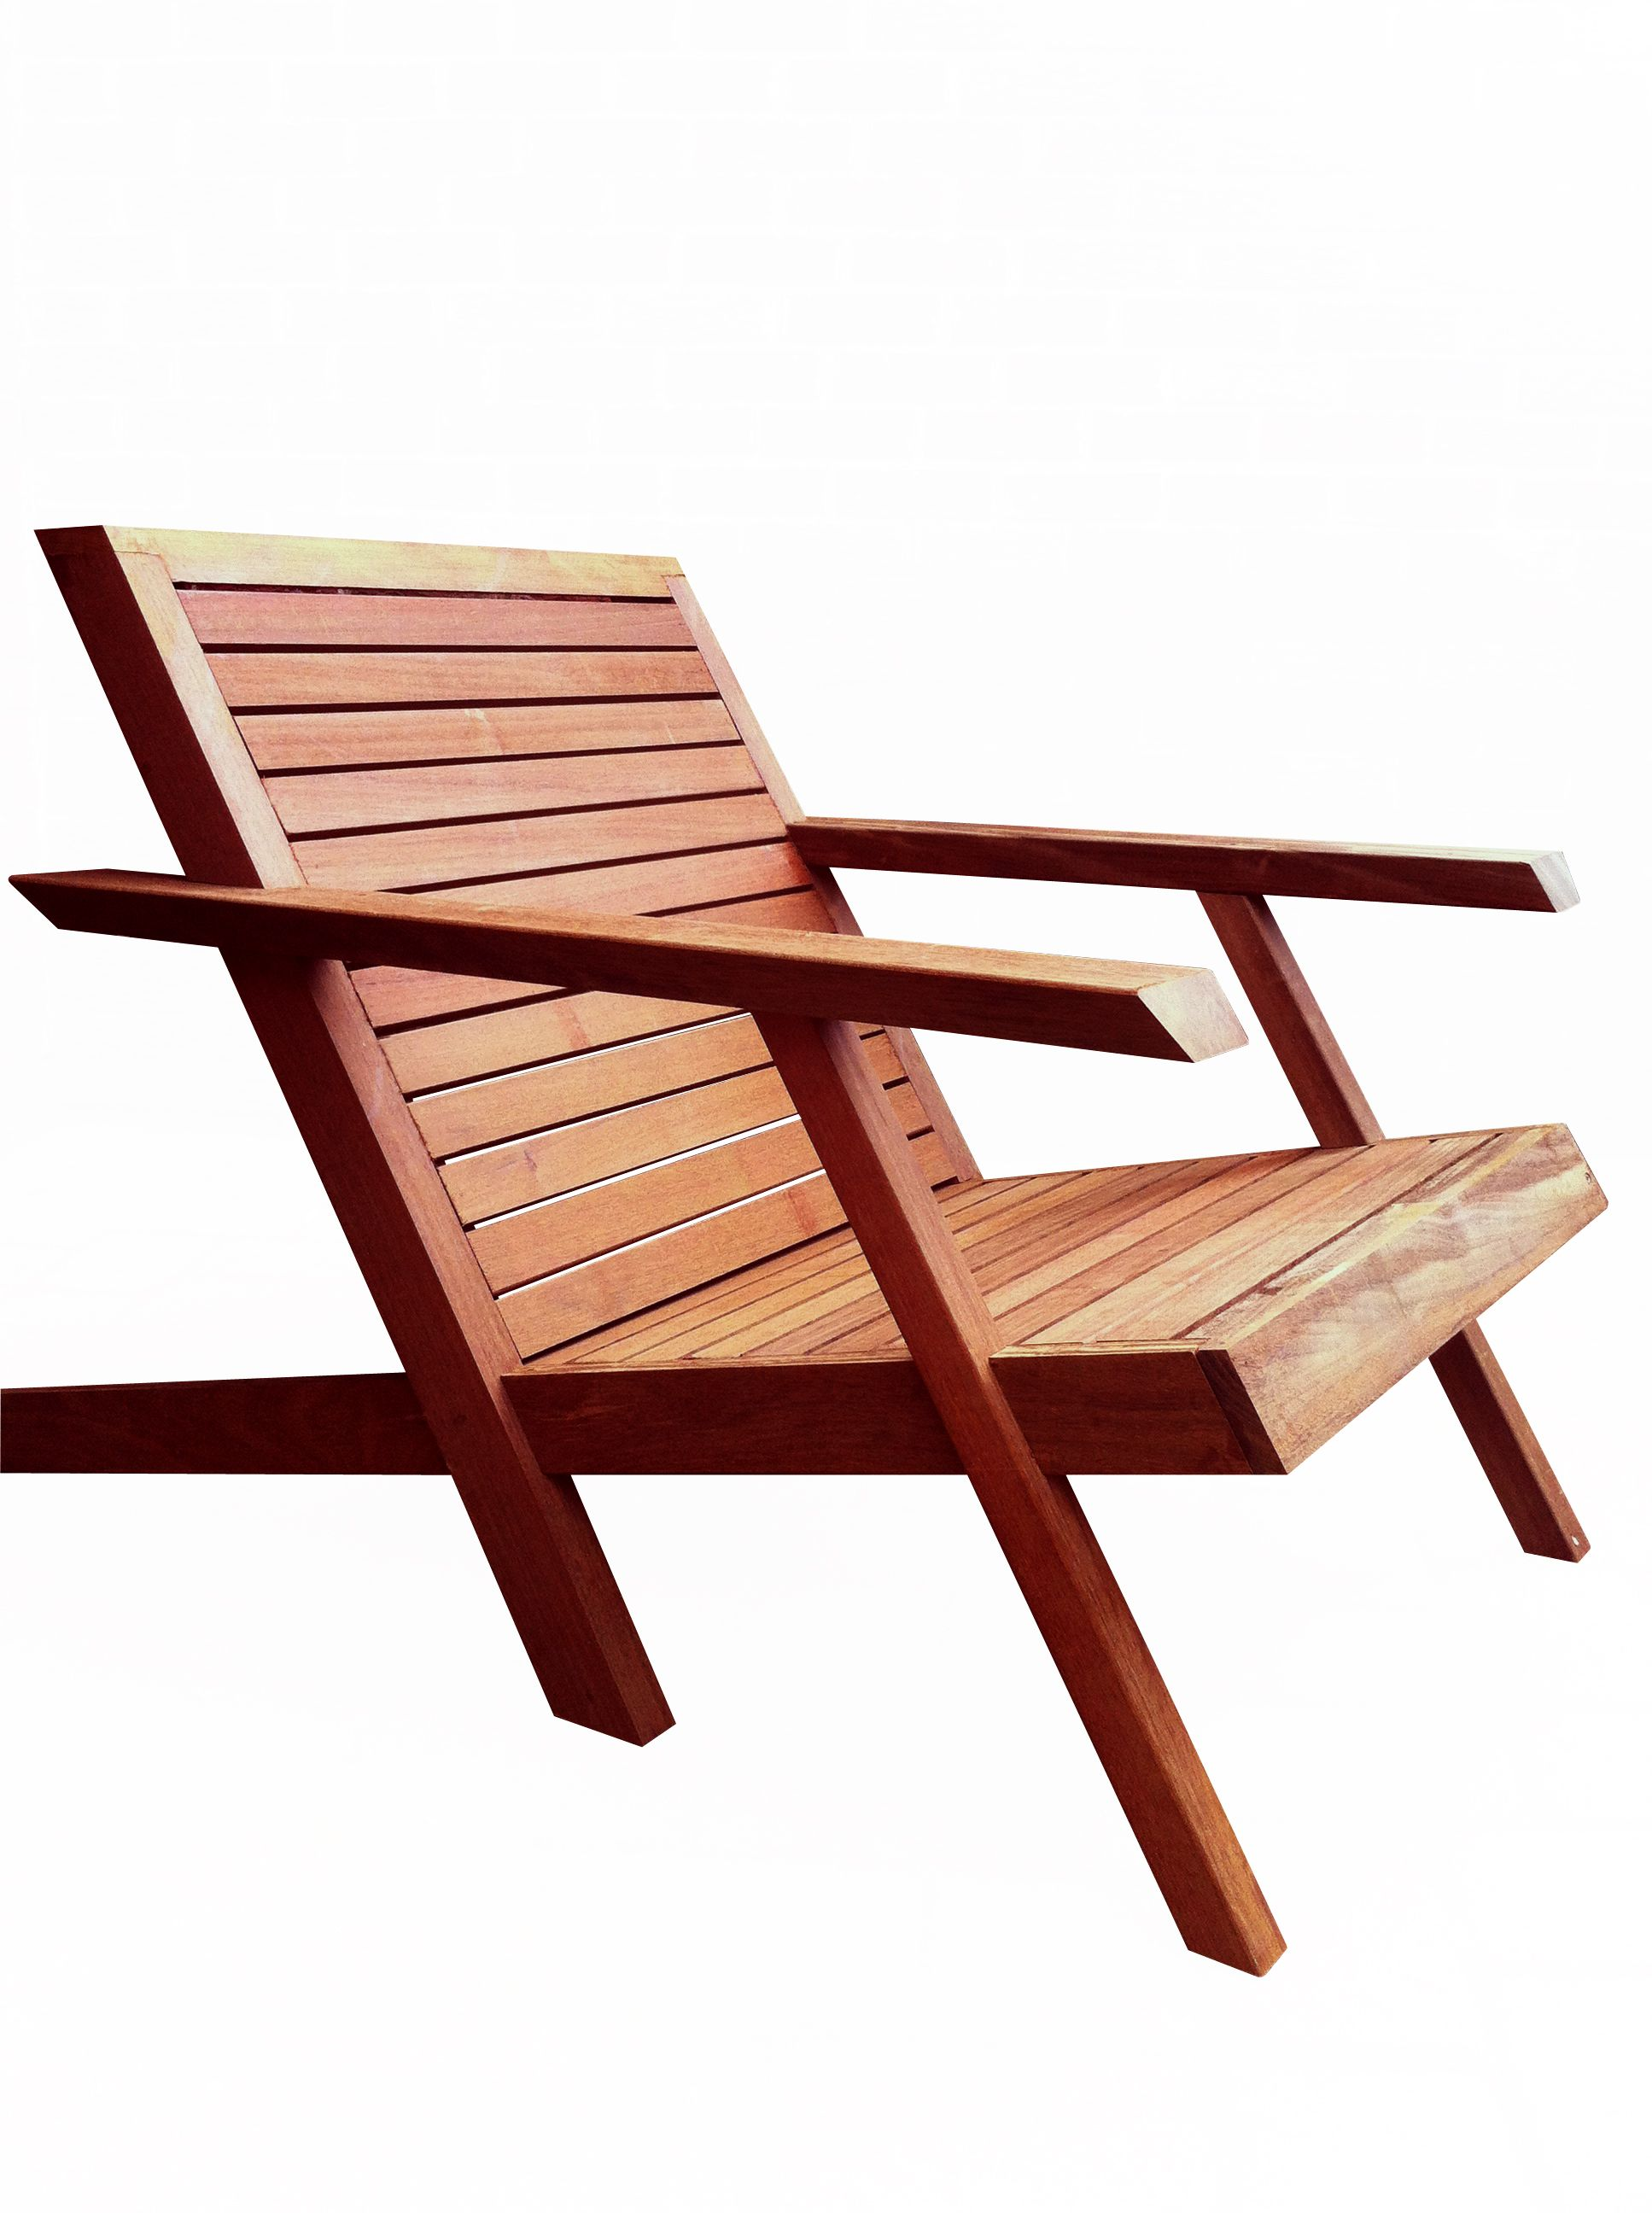 modern adirondack chair endgrain. Black Bedroom Furniture Sets. Home Design Ideas